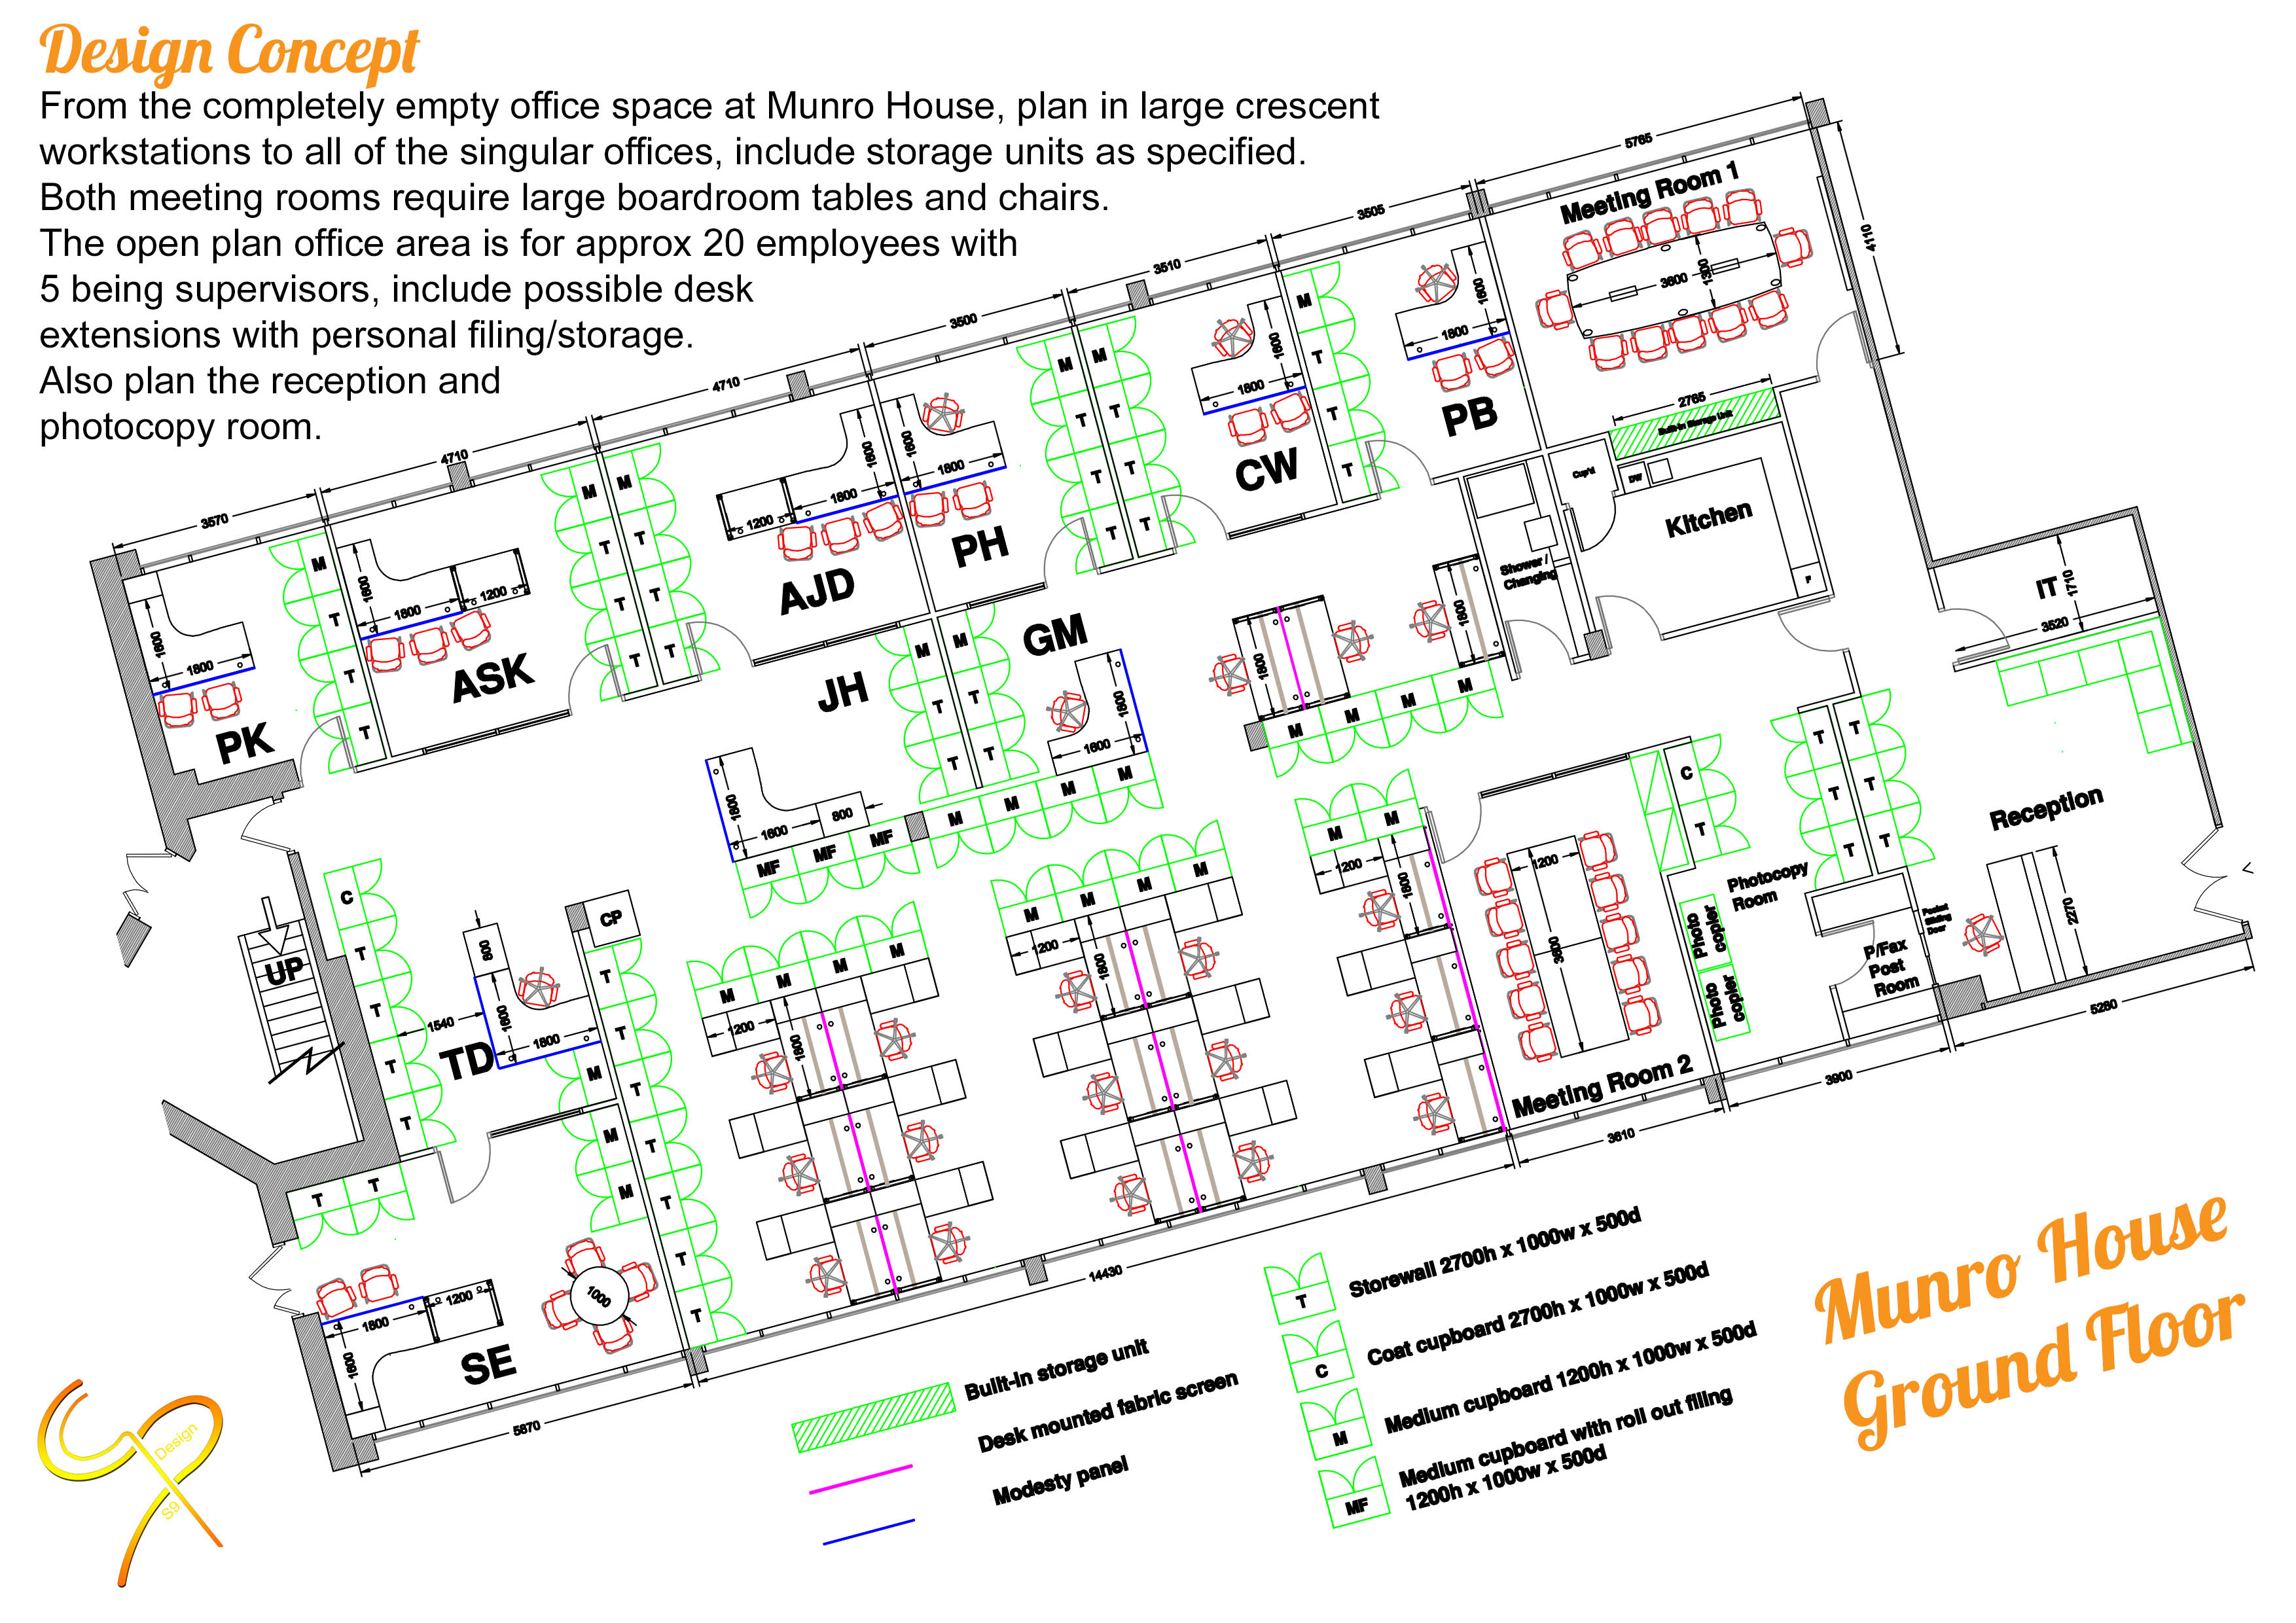 Munro House - Ground Floor